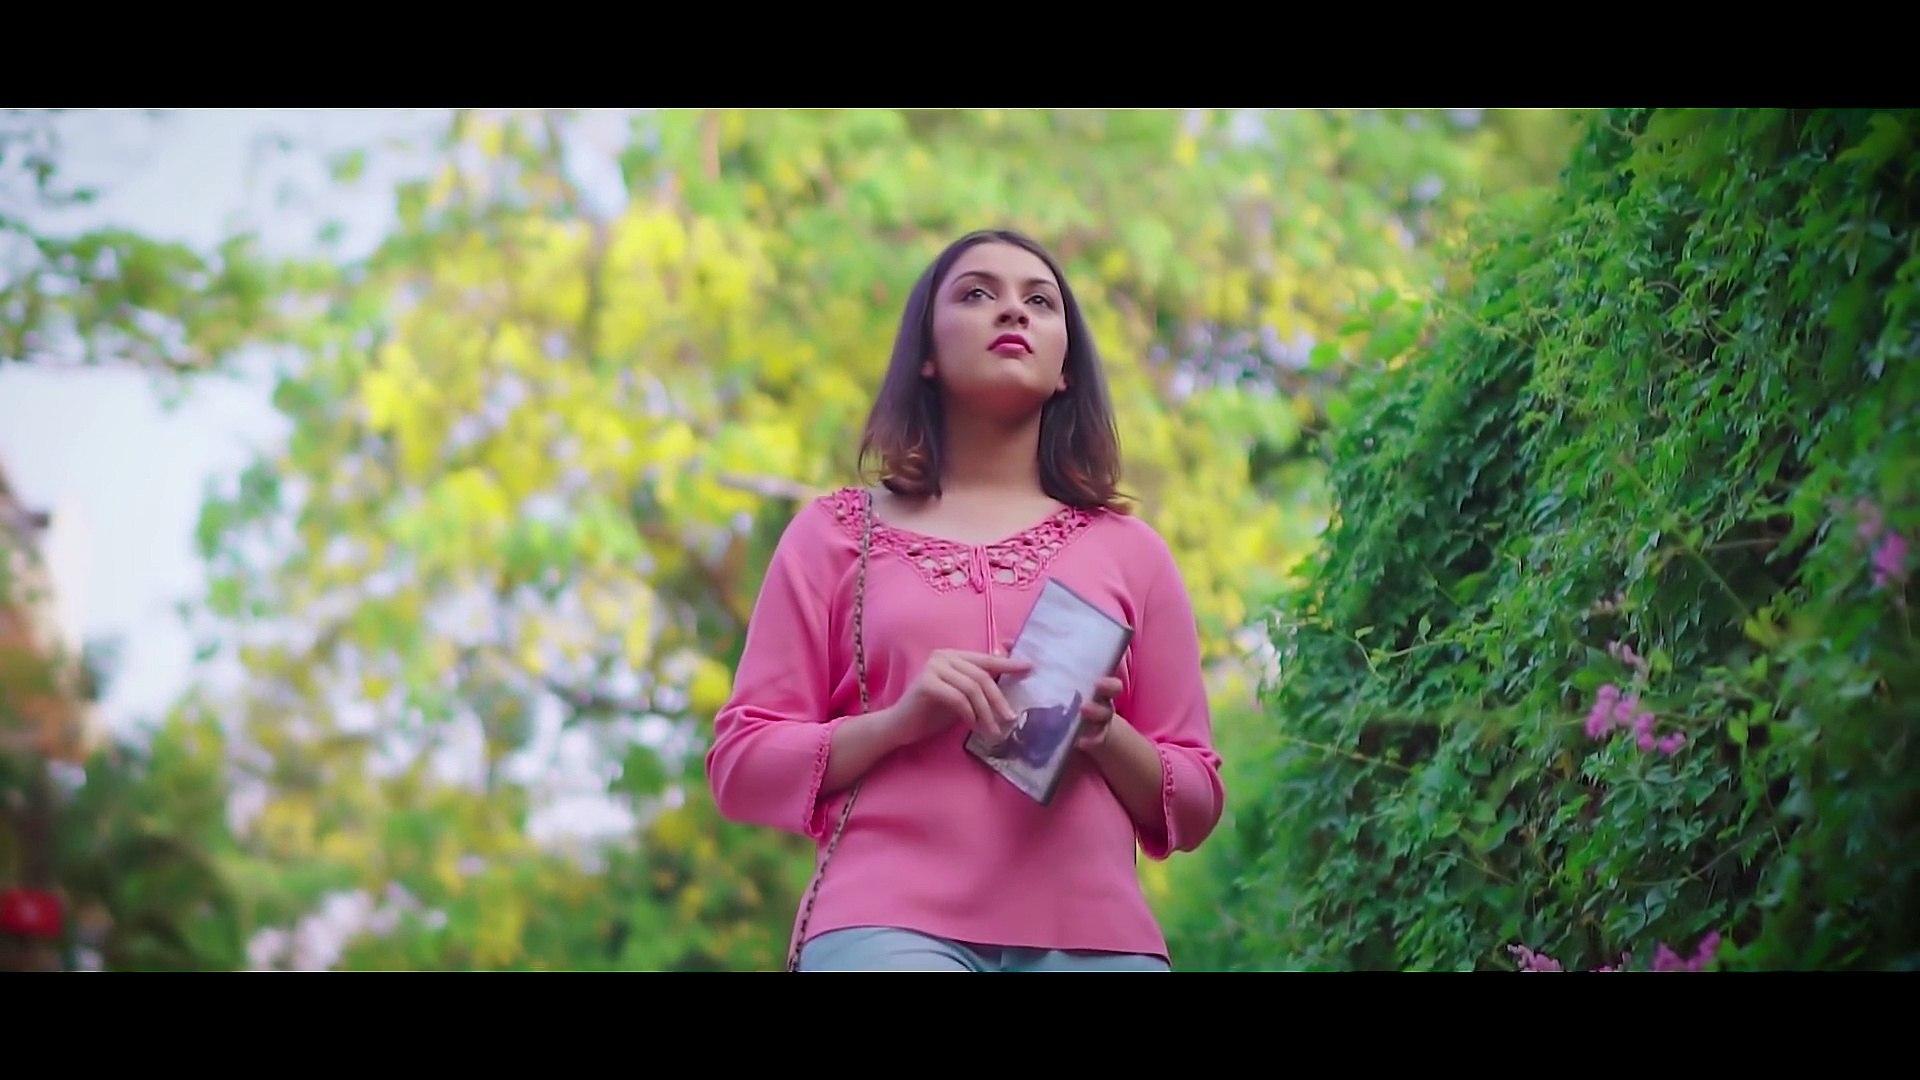 Tujhse Naraz Nahi Zindagi Female Cover   Sanam   Lata Mangeshkar Hits Old Hindi Songs version by wwe